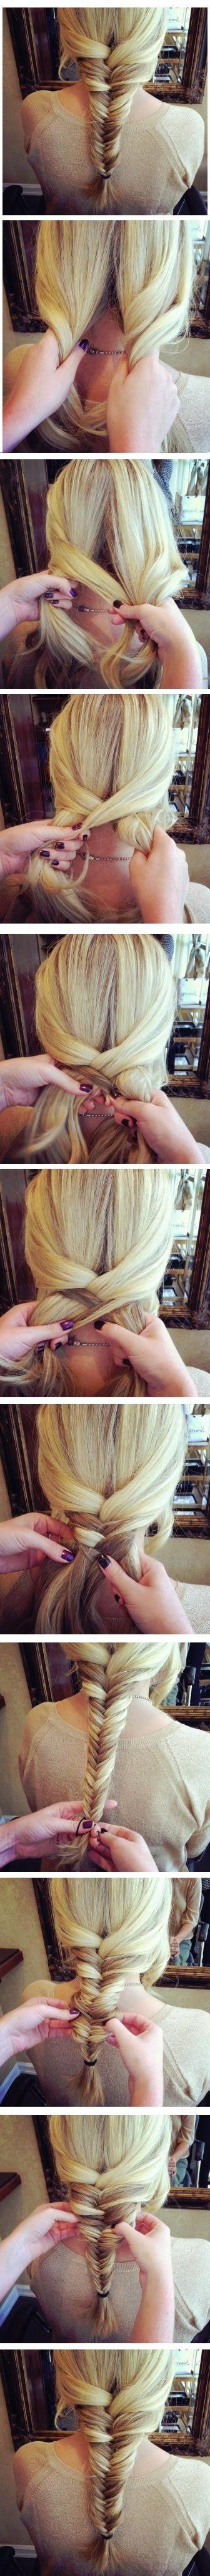 Fishtail braid tutorial cute hairstyles for girls loose fishtail